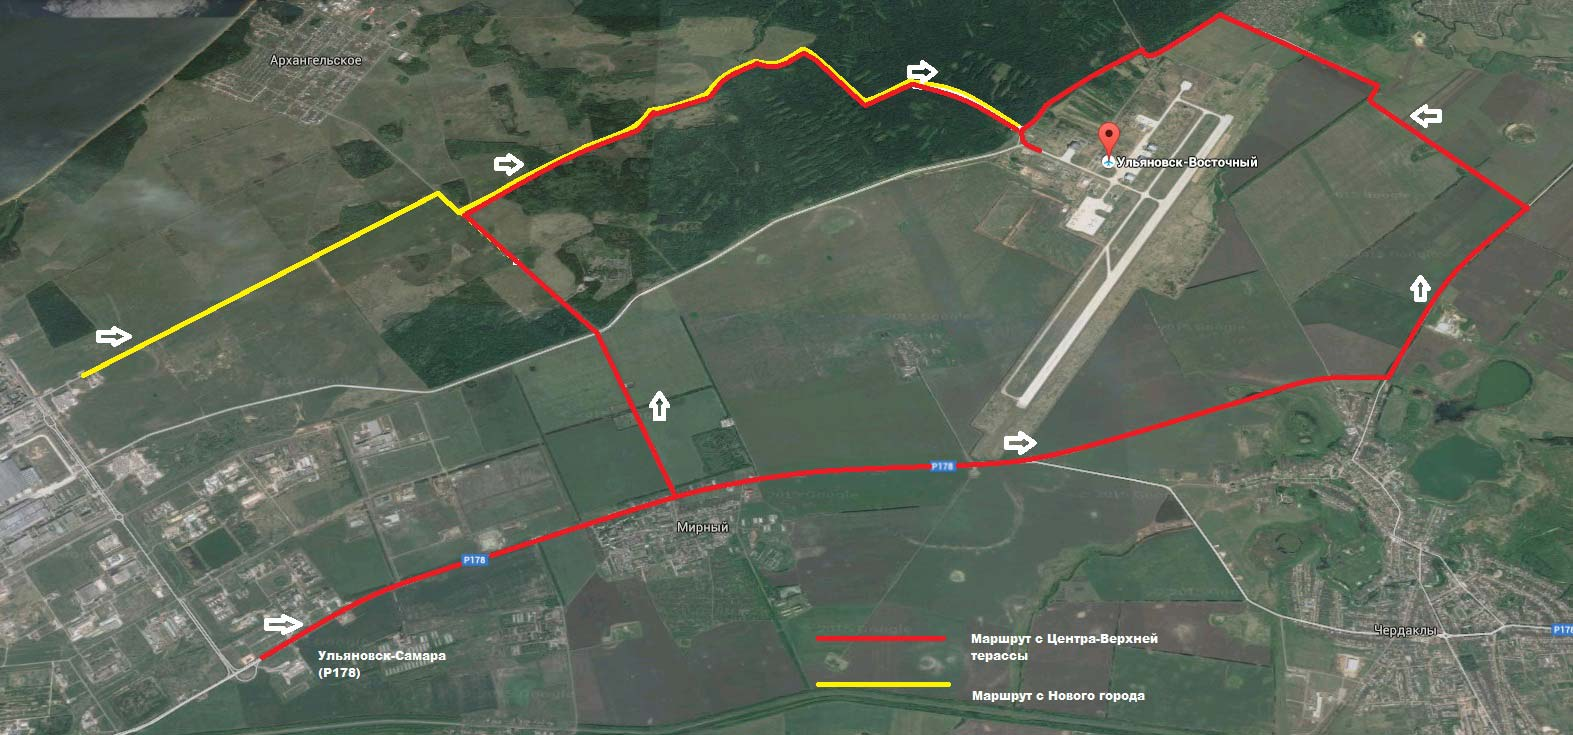 Аэропорт Ульяновск Восточный (Ulyanovsk ...: kakdobratsyado.ru/country/rf/aeroports-rf/aeroport-ulyanovsk...